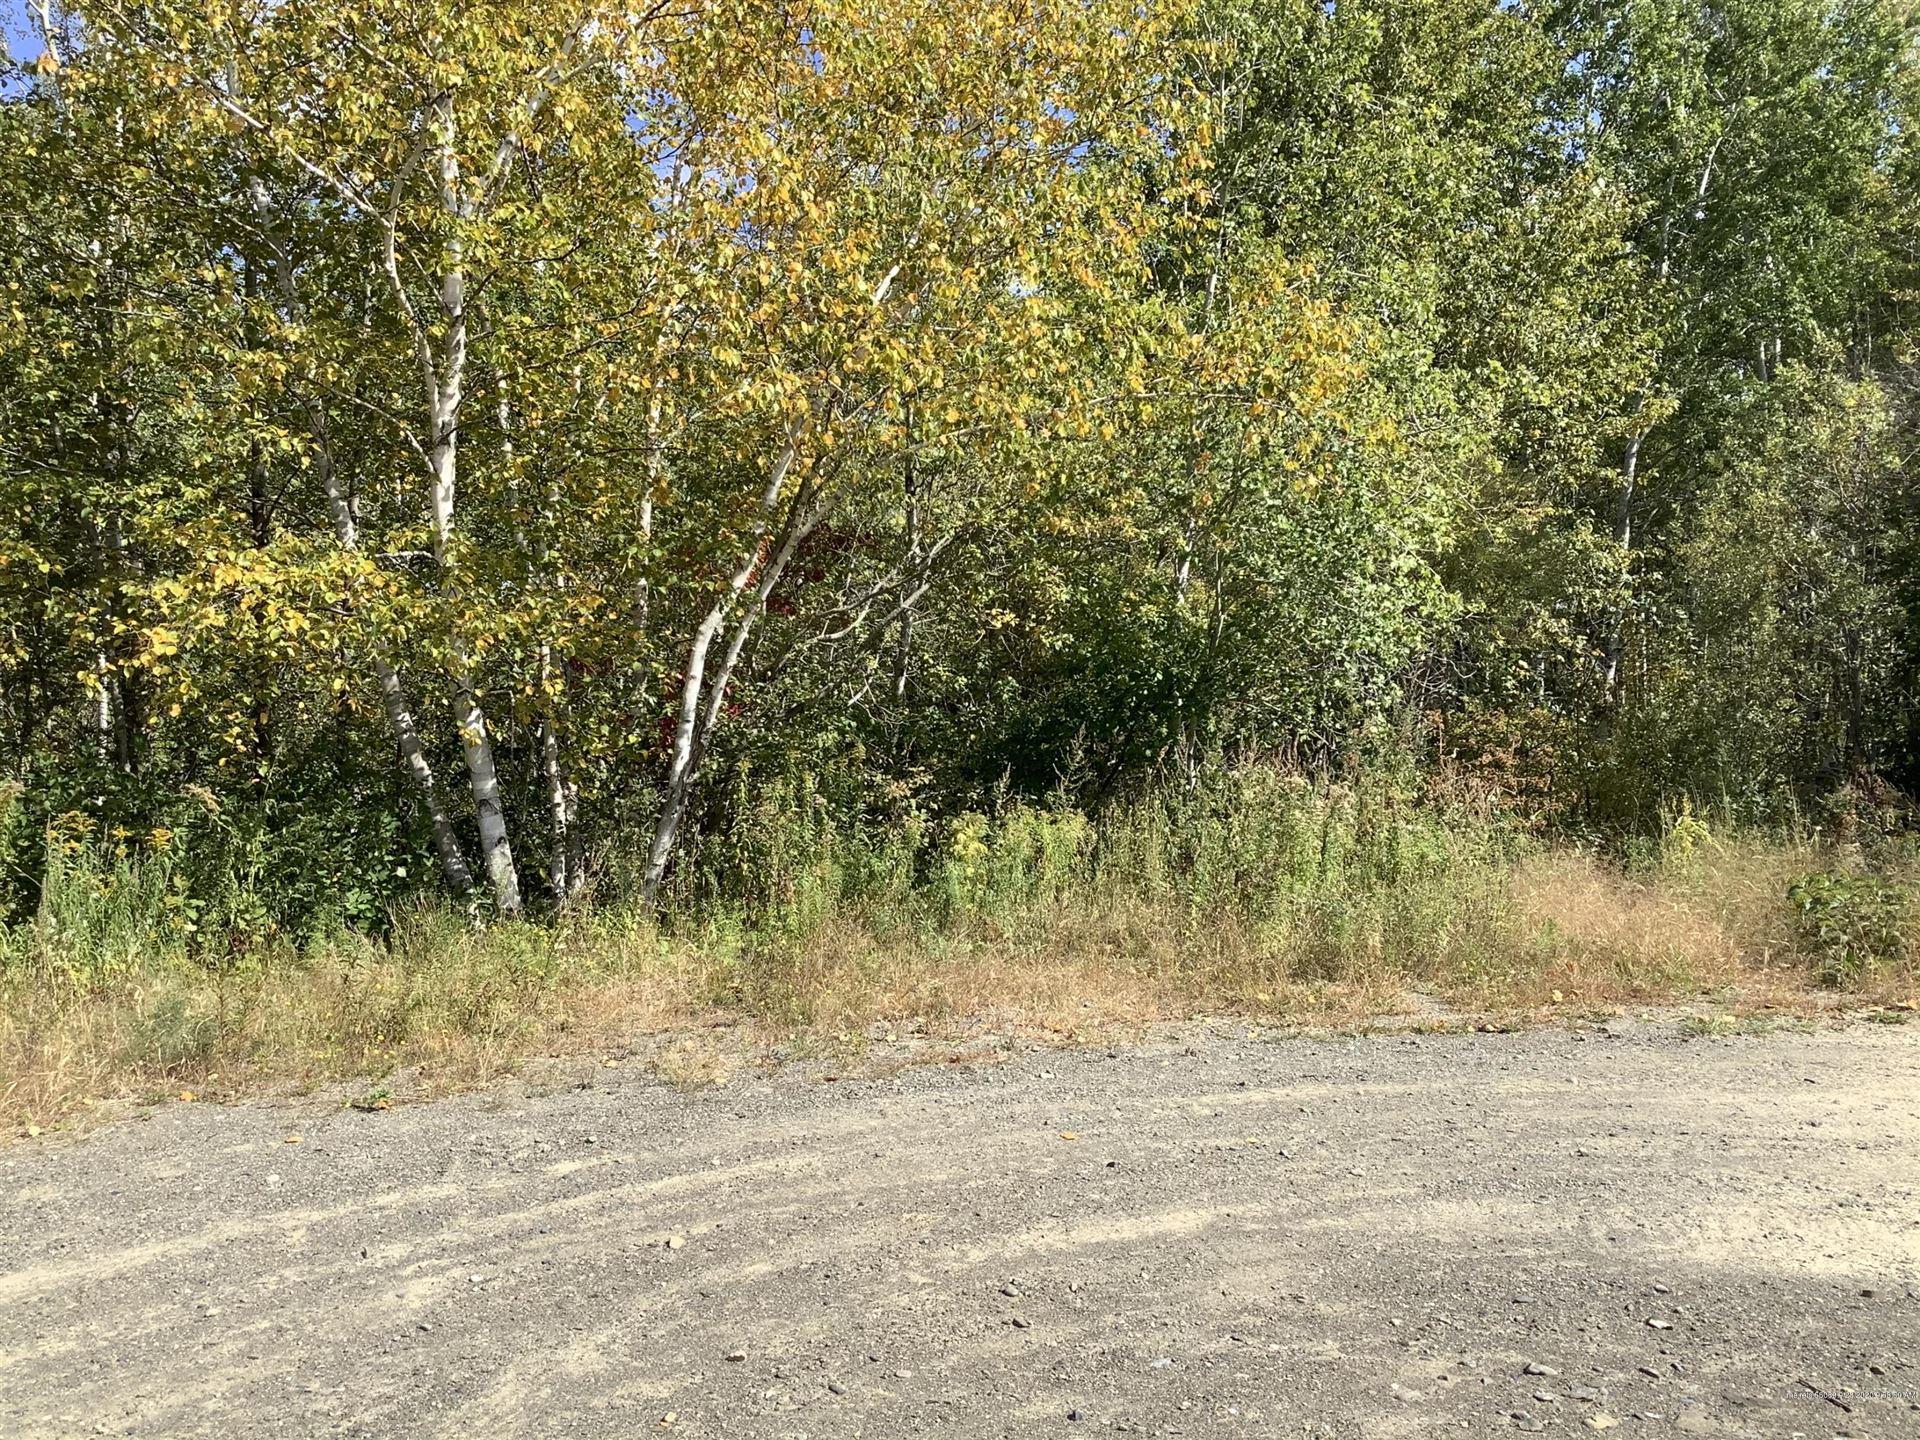 Photo of 0 Dumond Road, Fort Fairfield, ME 04742 (MLS # 1469954)